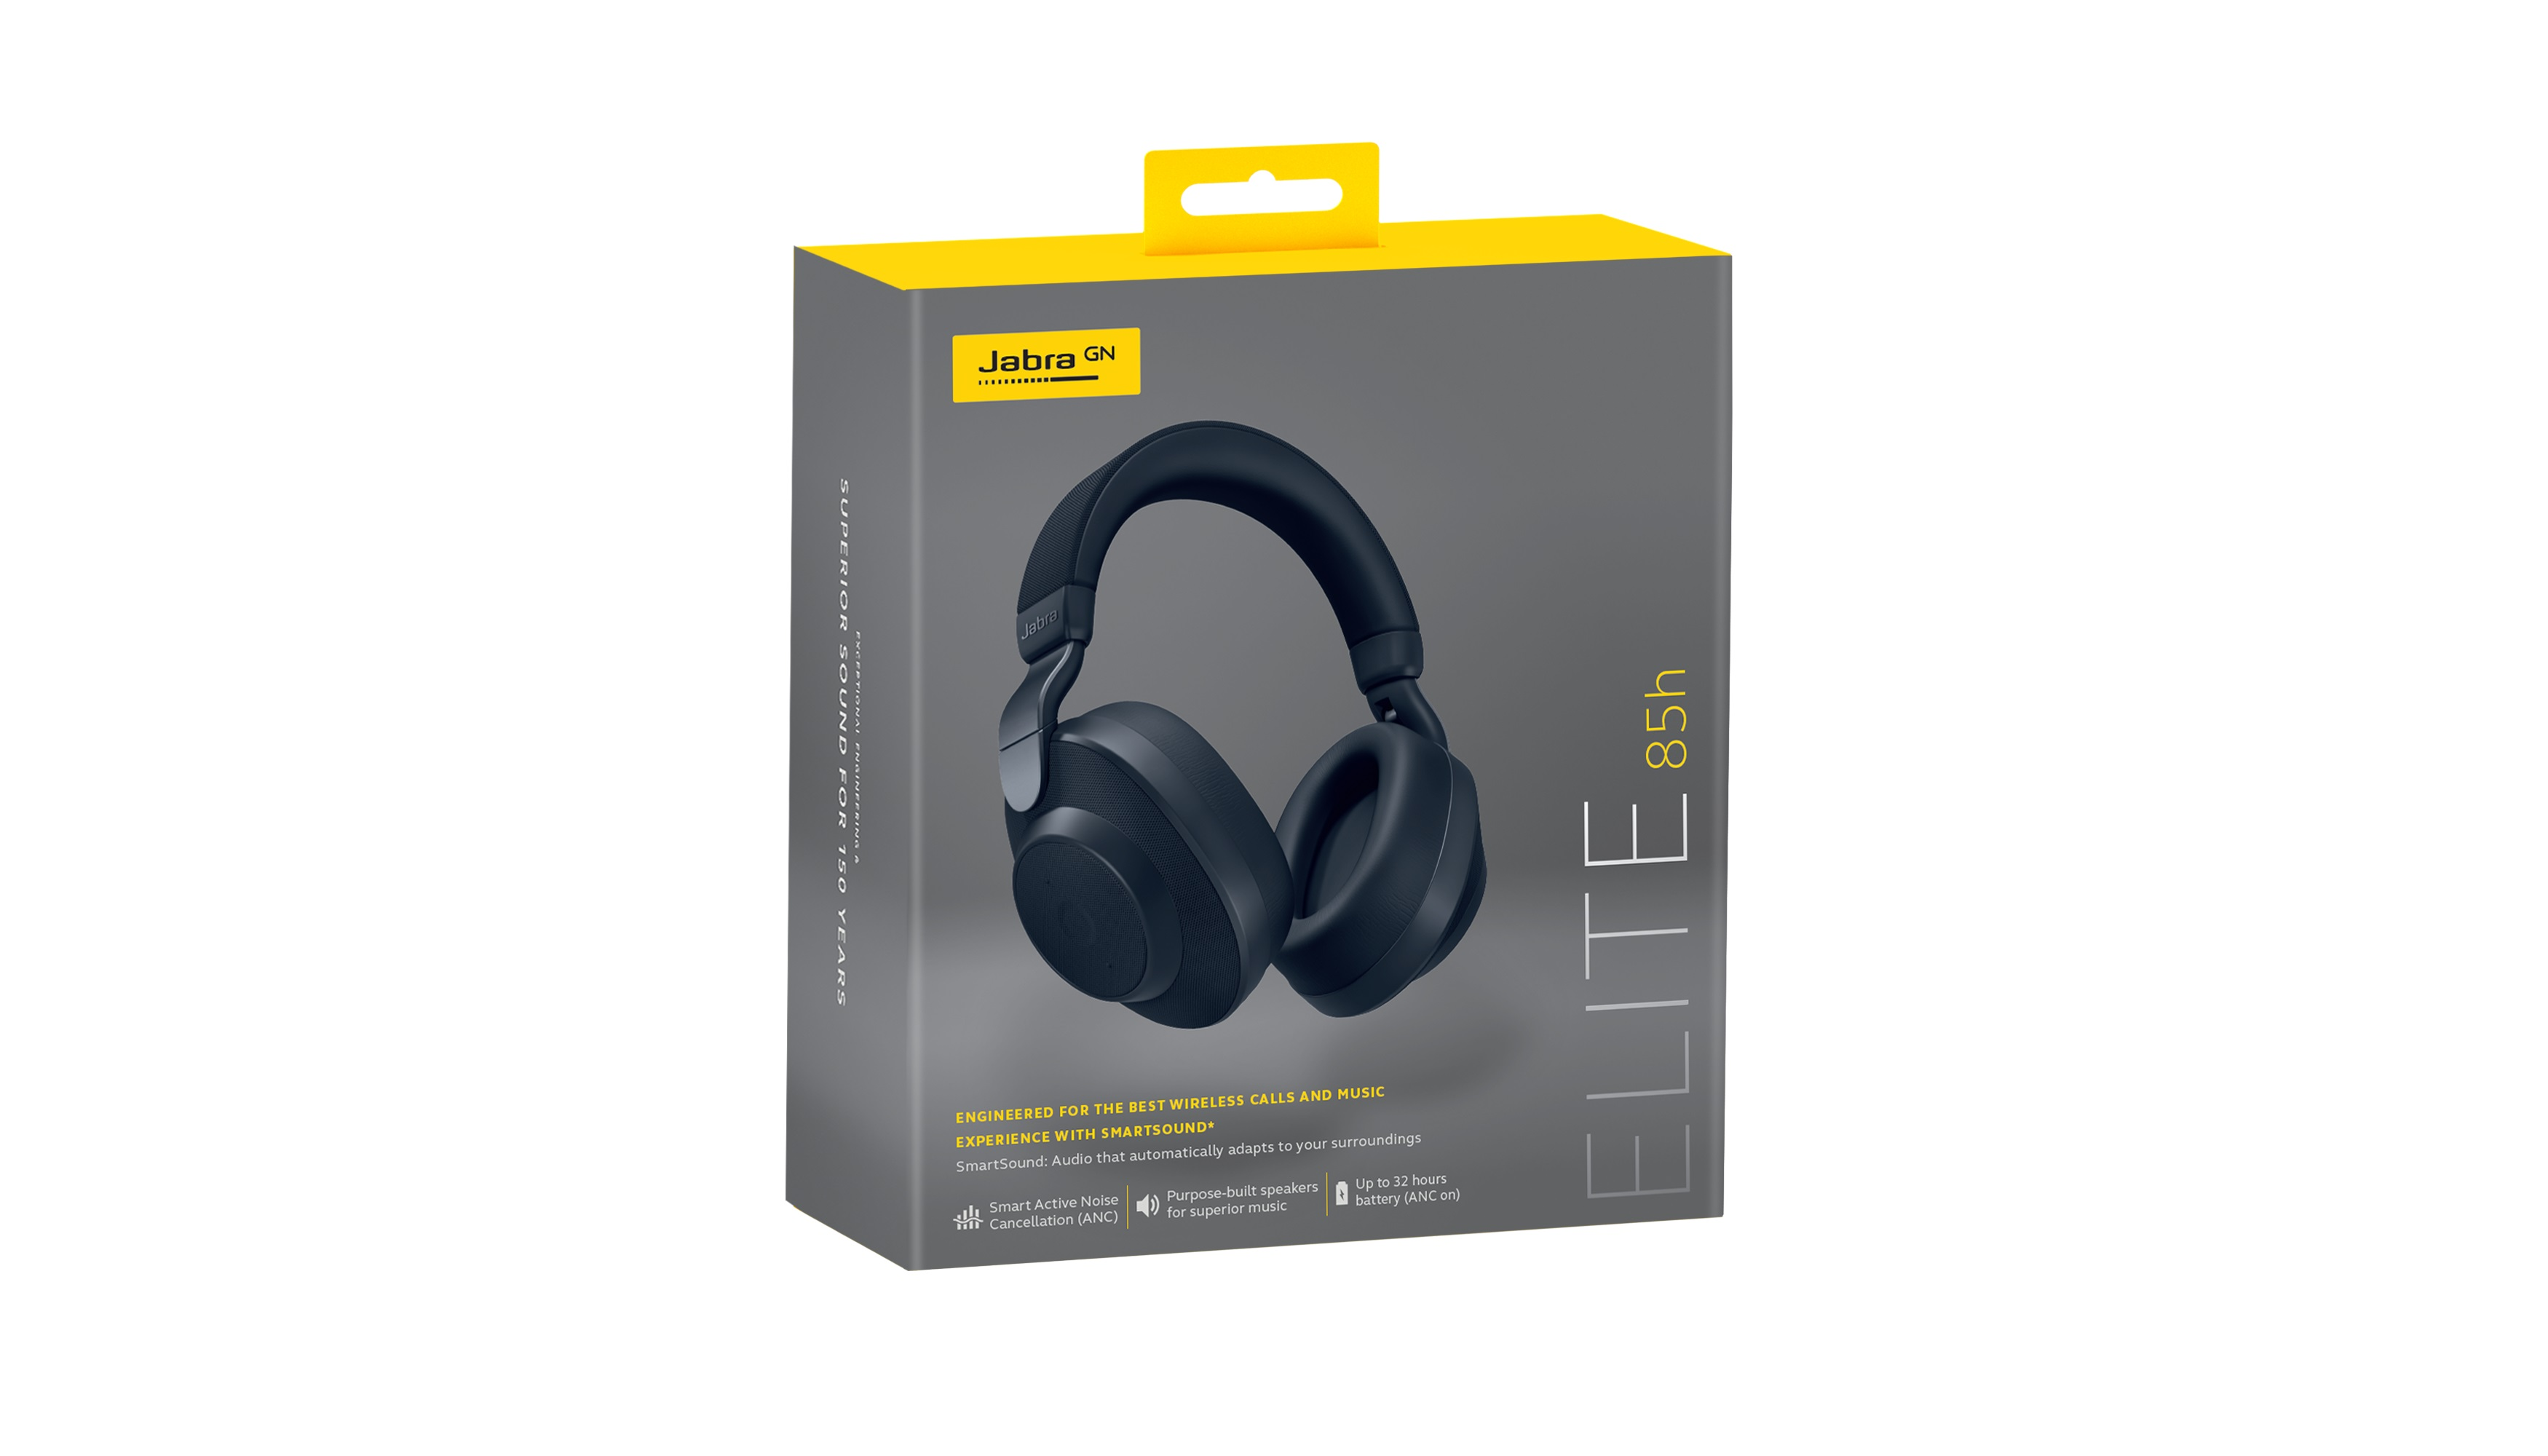 Jabra-Elite-85h-Wireless-Stereo-ANC-Headphones thumbnail 17